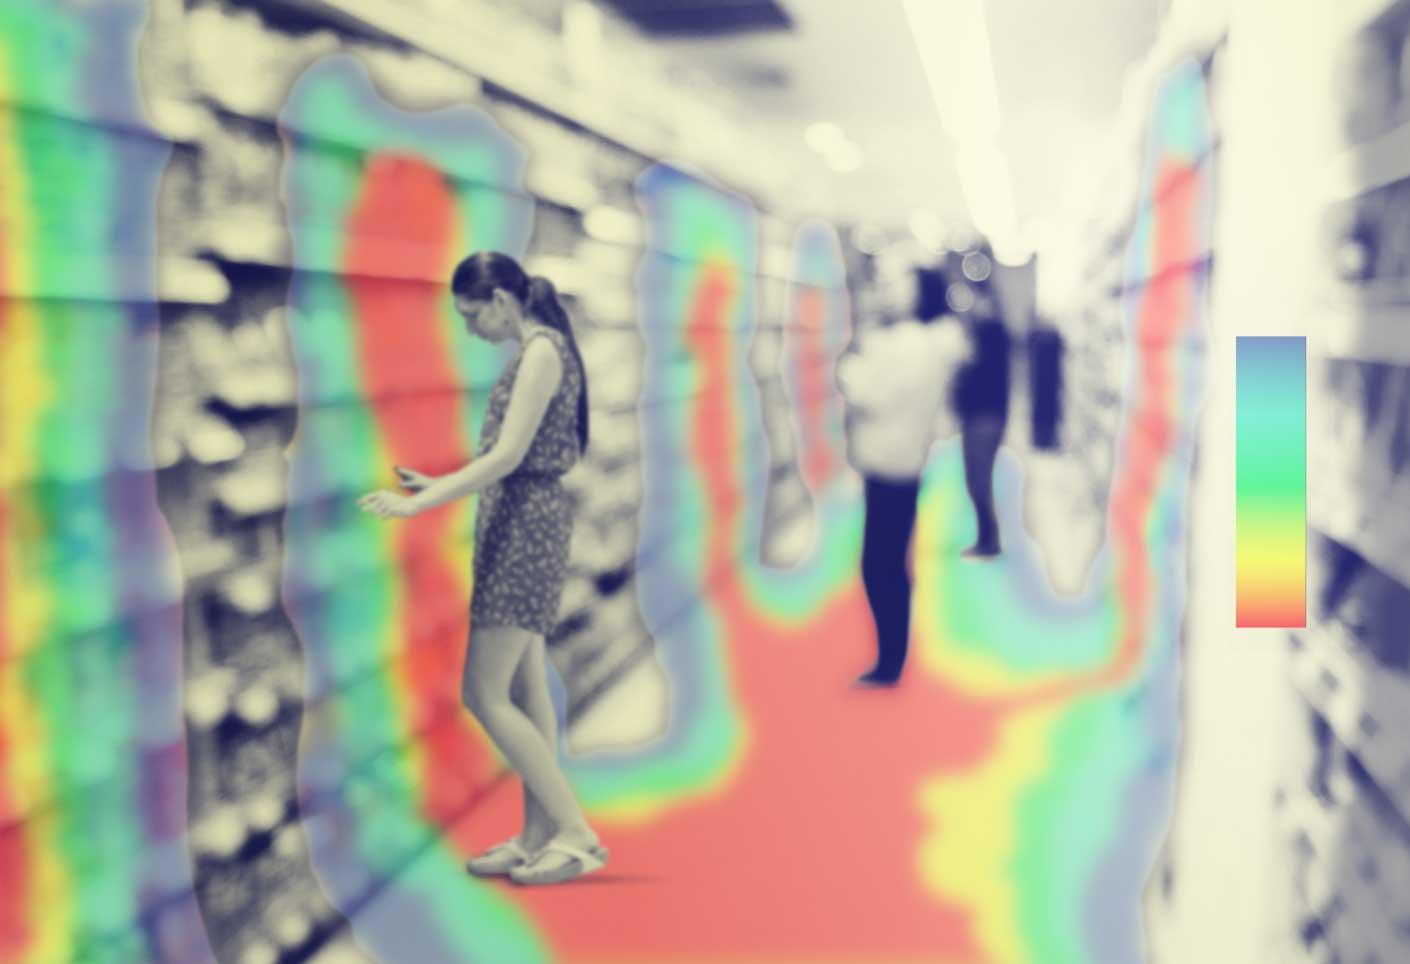 Retail behaviour analytics